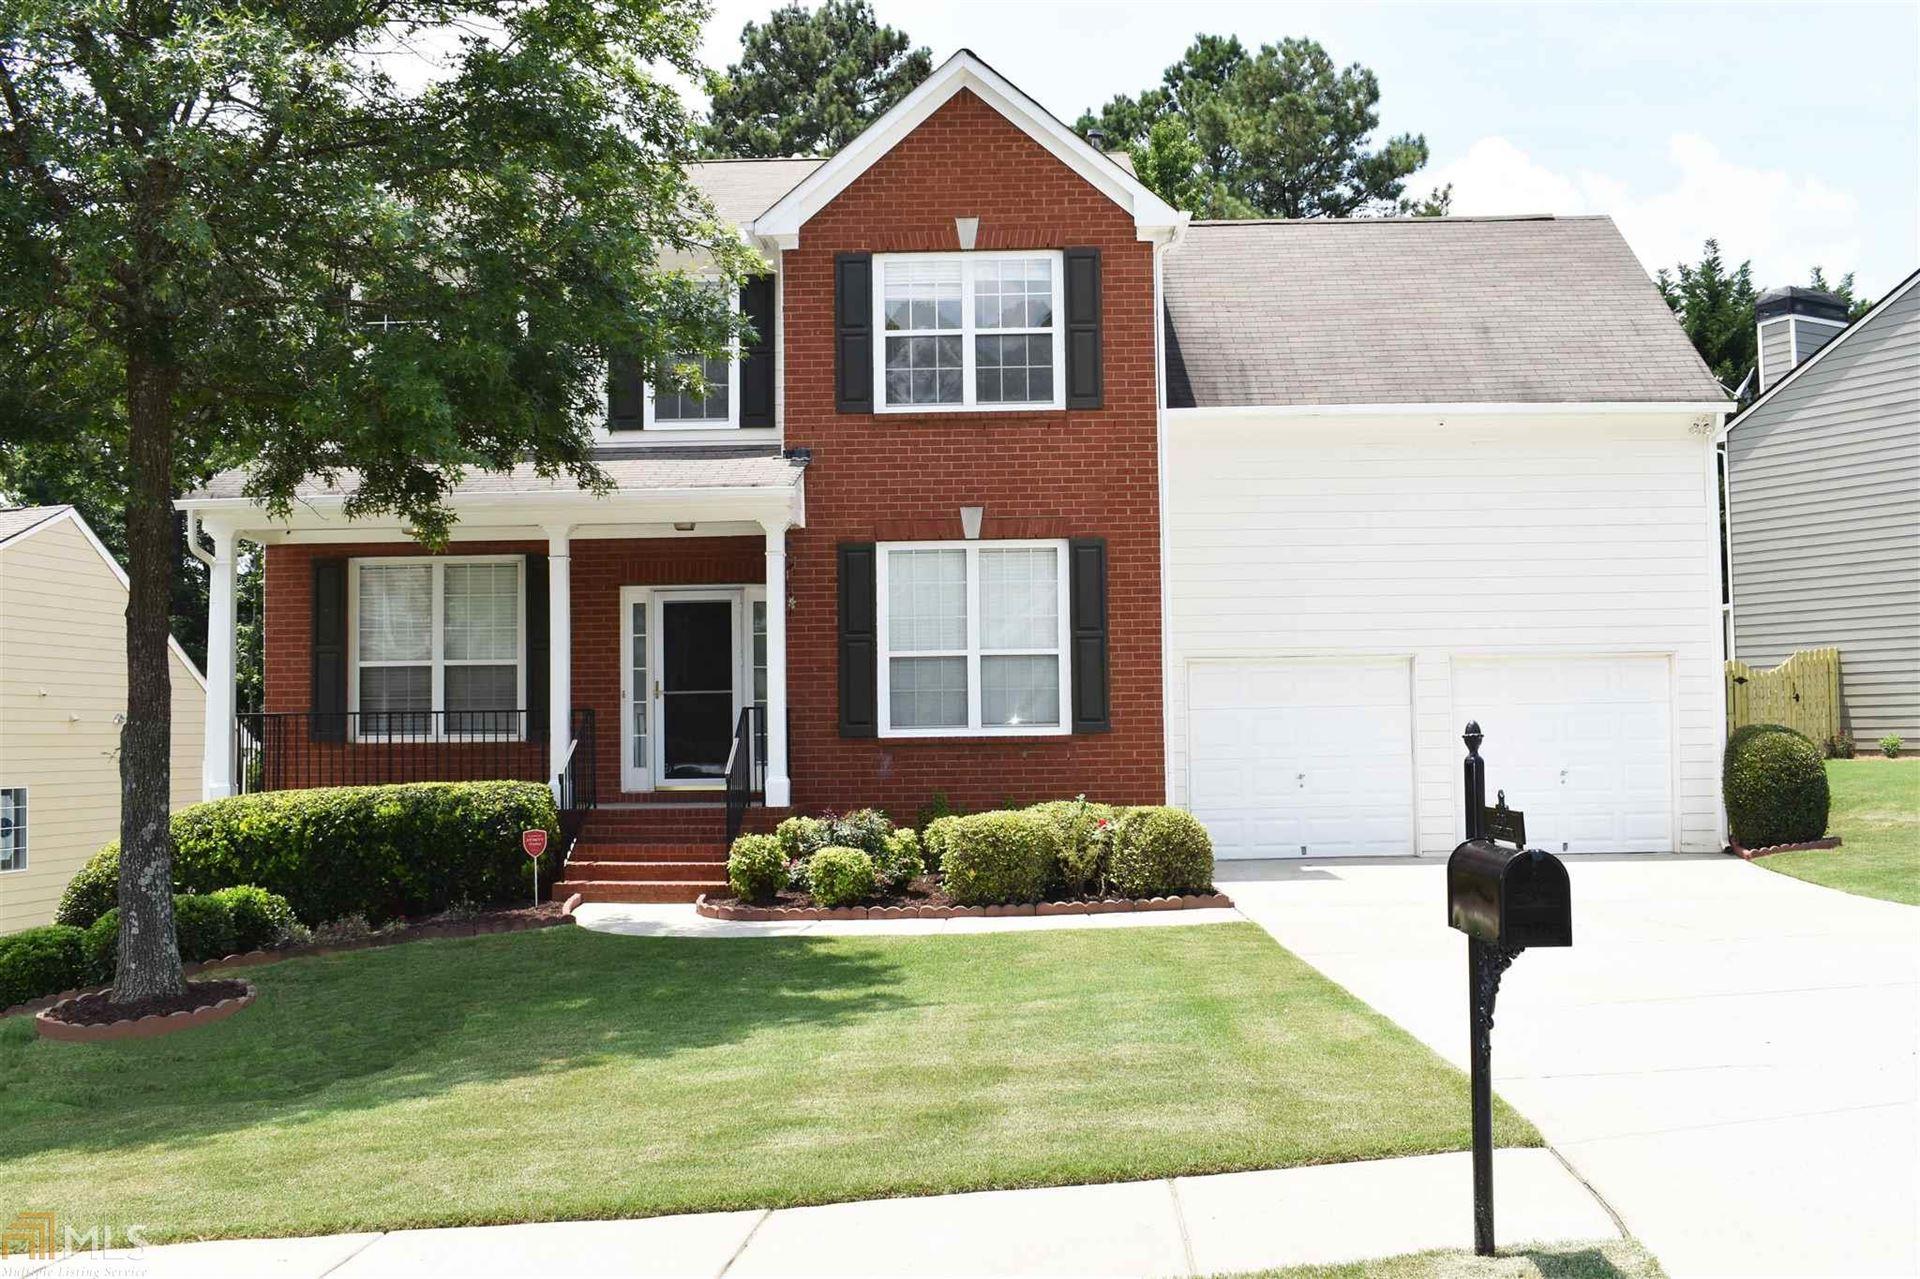 3135 Manor Ct, Snellville, GA 30078 - #: 8999973